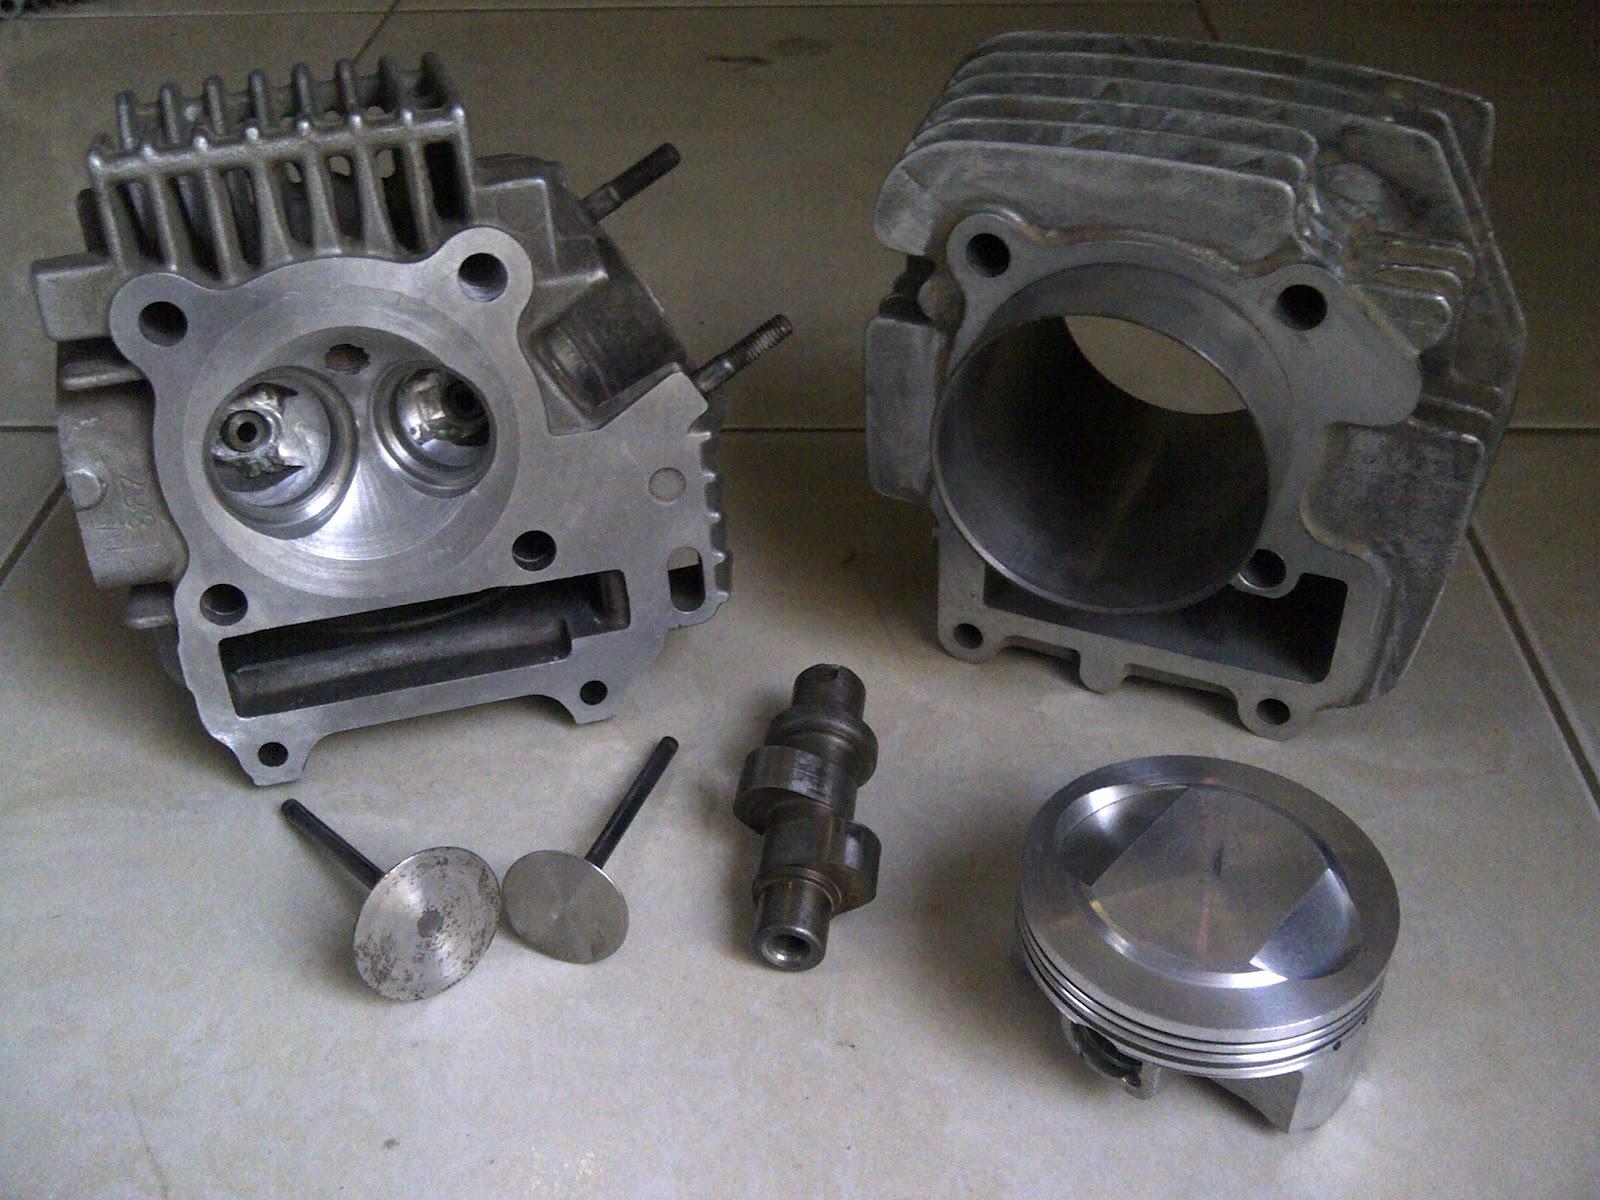 repair manual collection: tune up jupiter 200cc